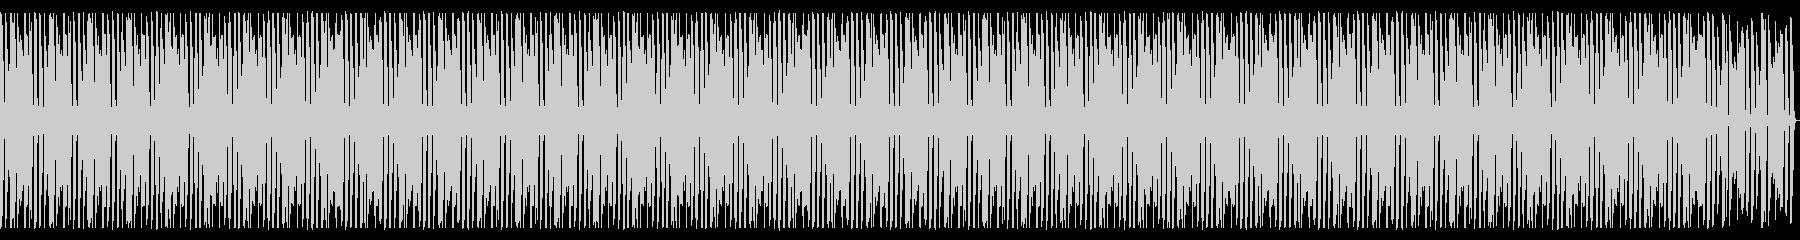 SELECT エレクトリックピアノ 愉快の未再生の波形